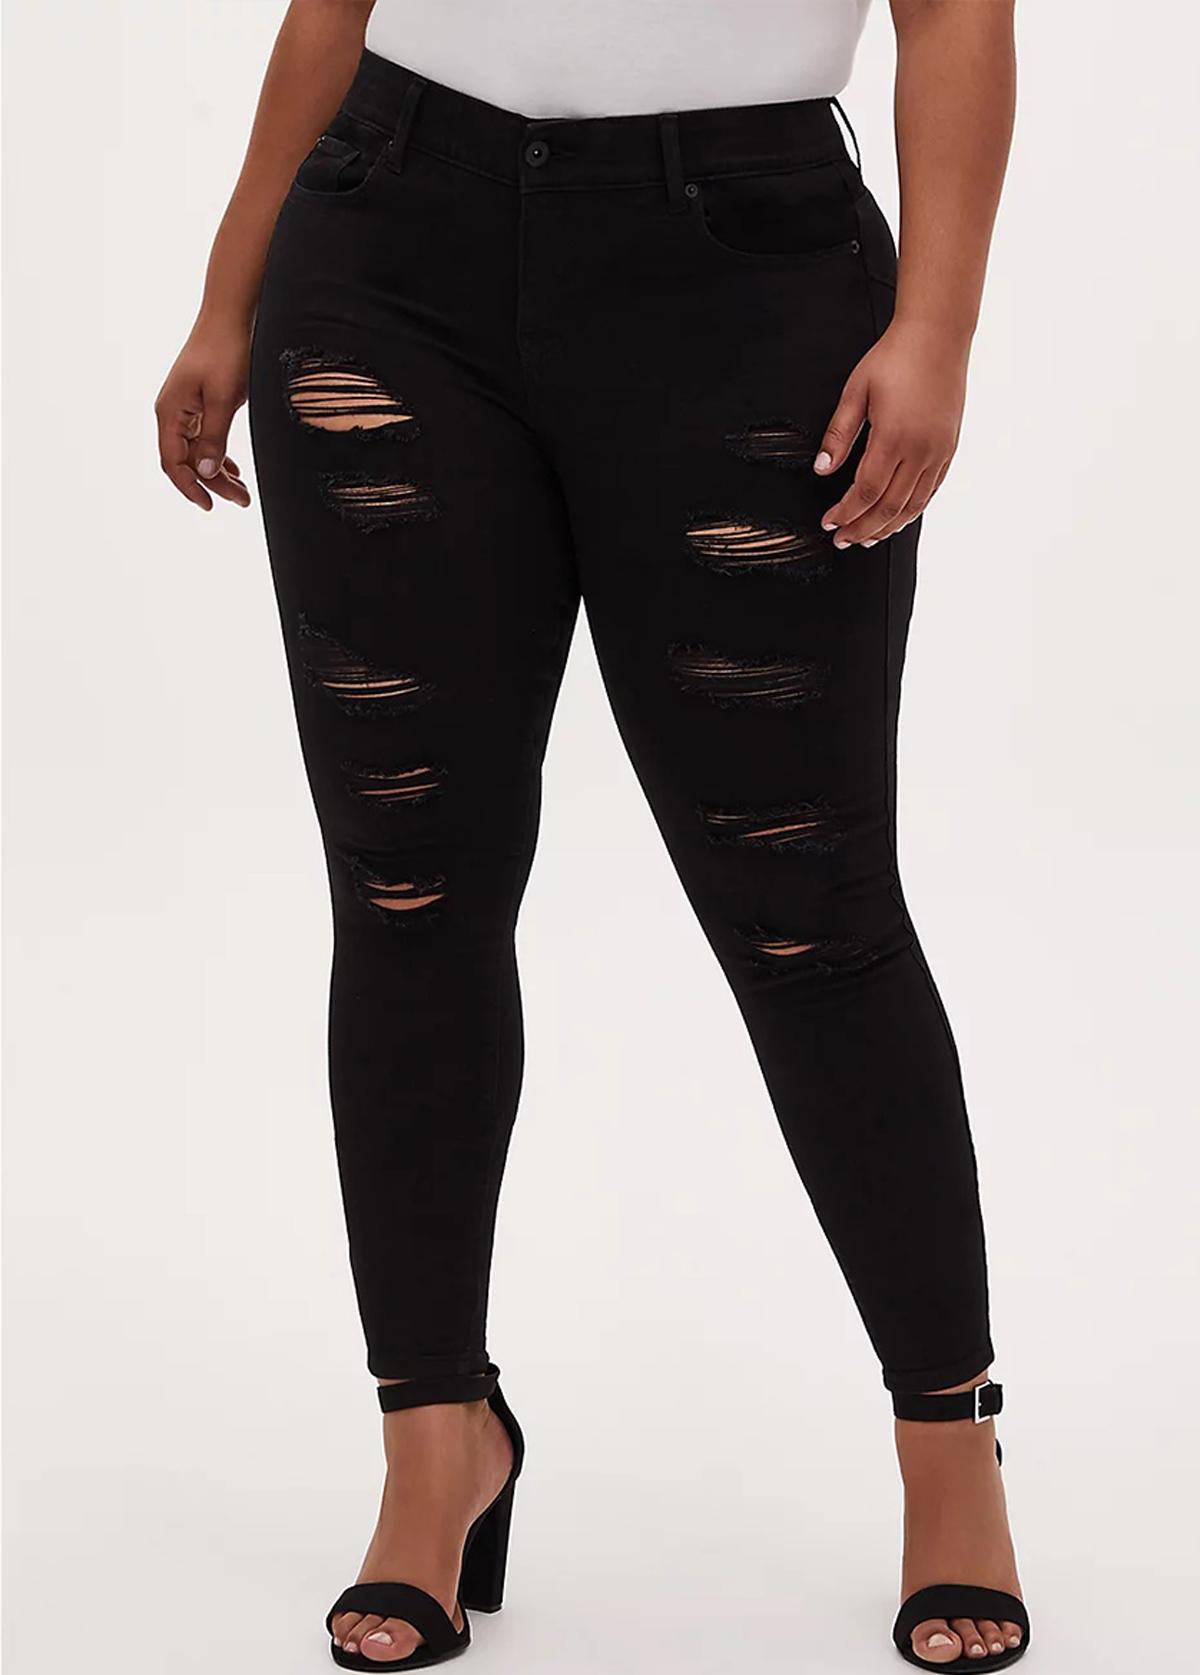 Shredded Skinny Plus Size Black Jeans